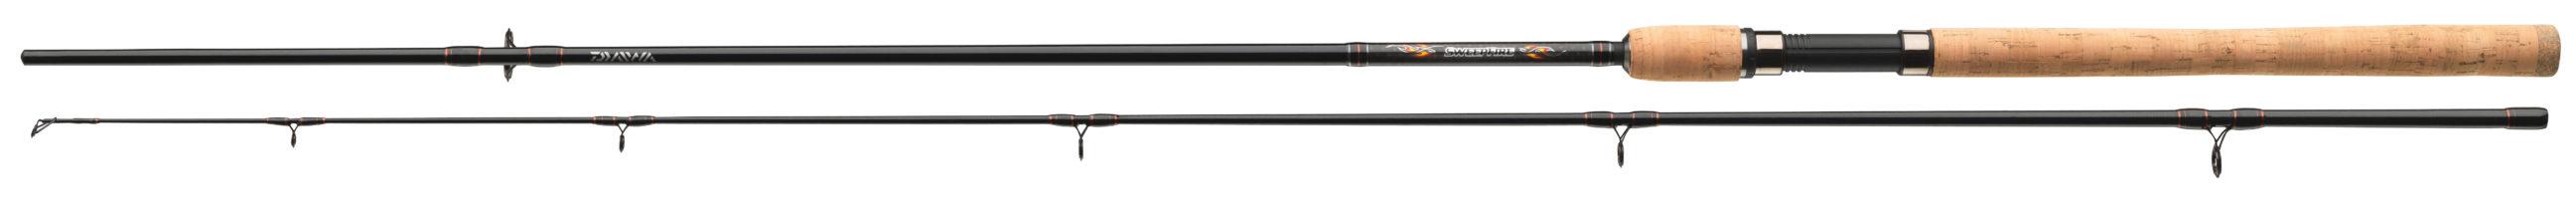 DAIWA SWEEPFIRE SPIN 240CM/20-60G